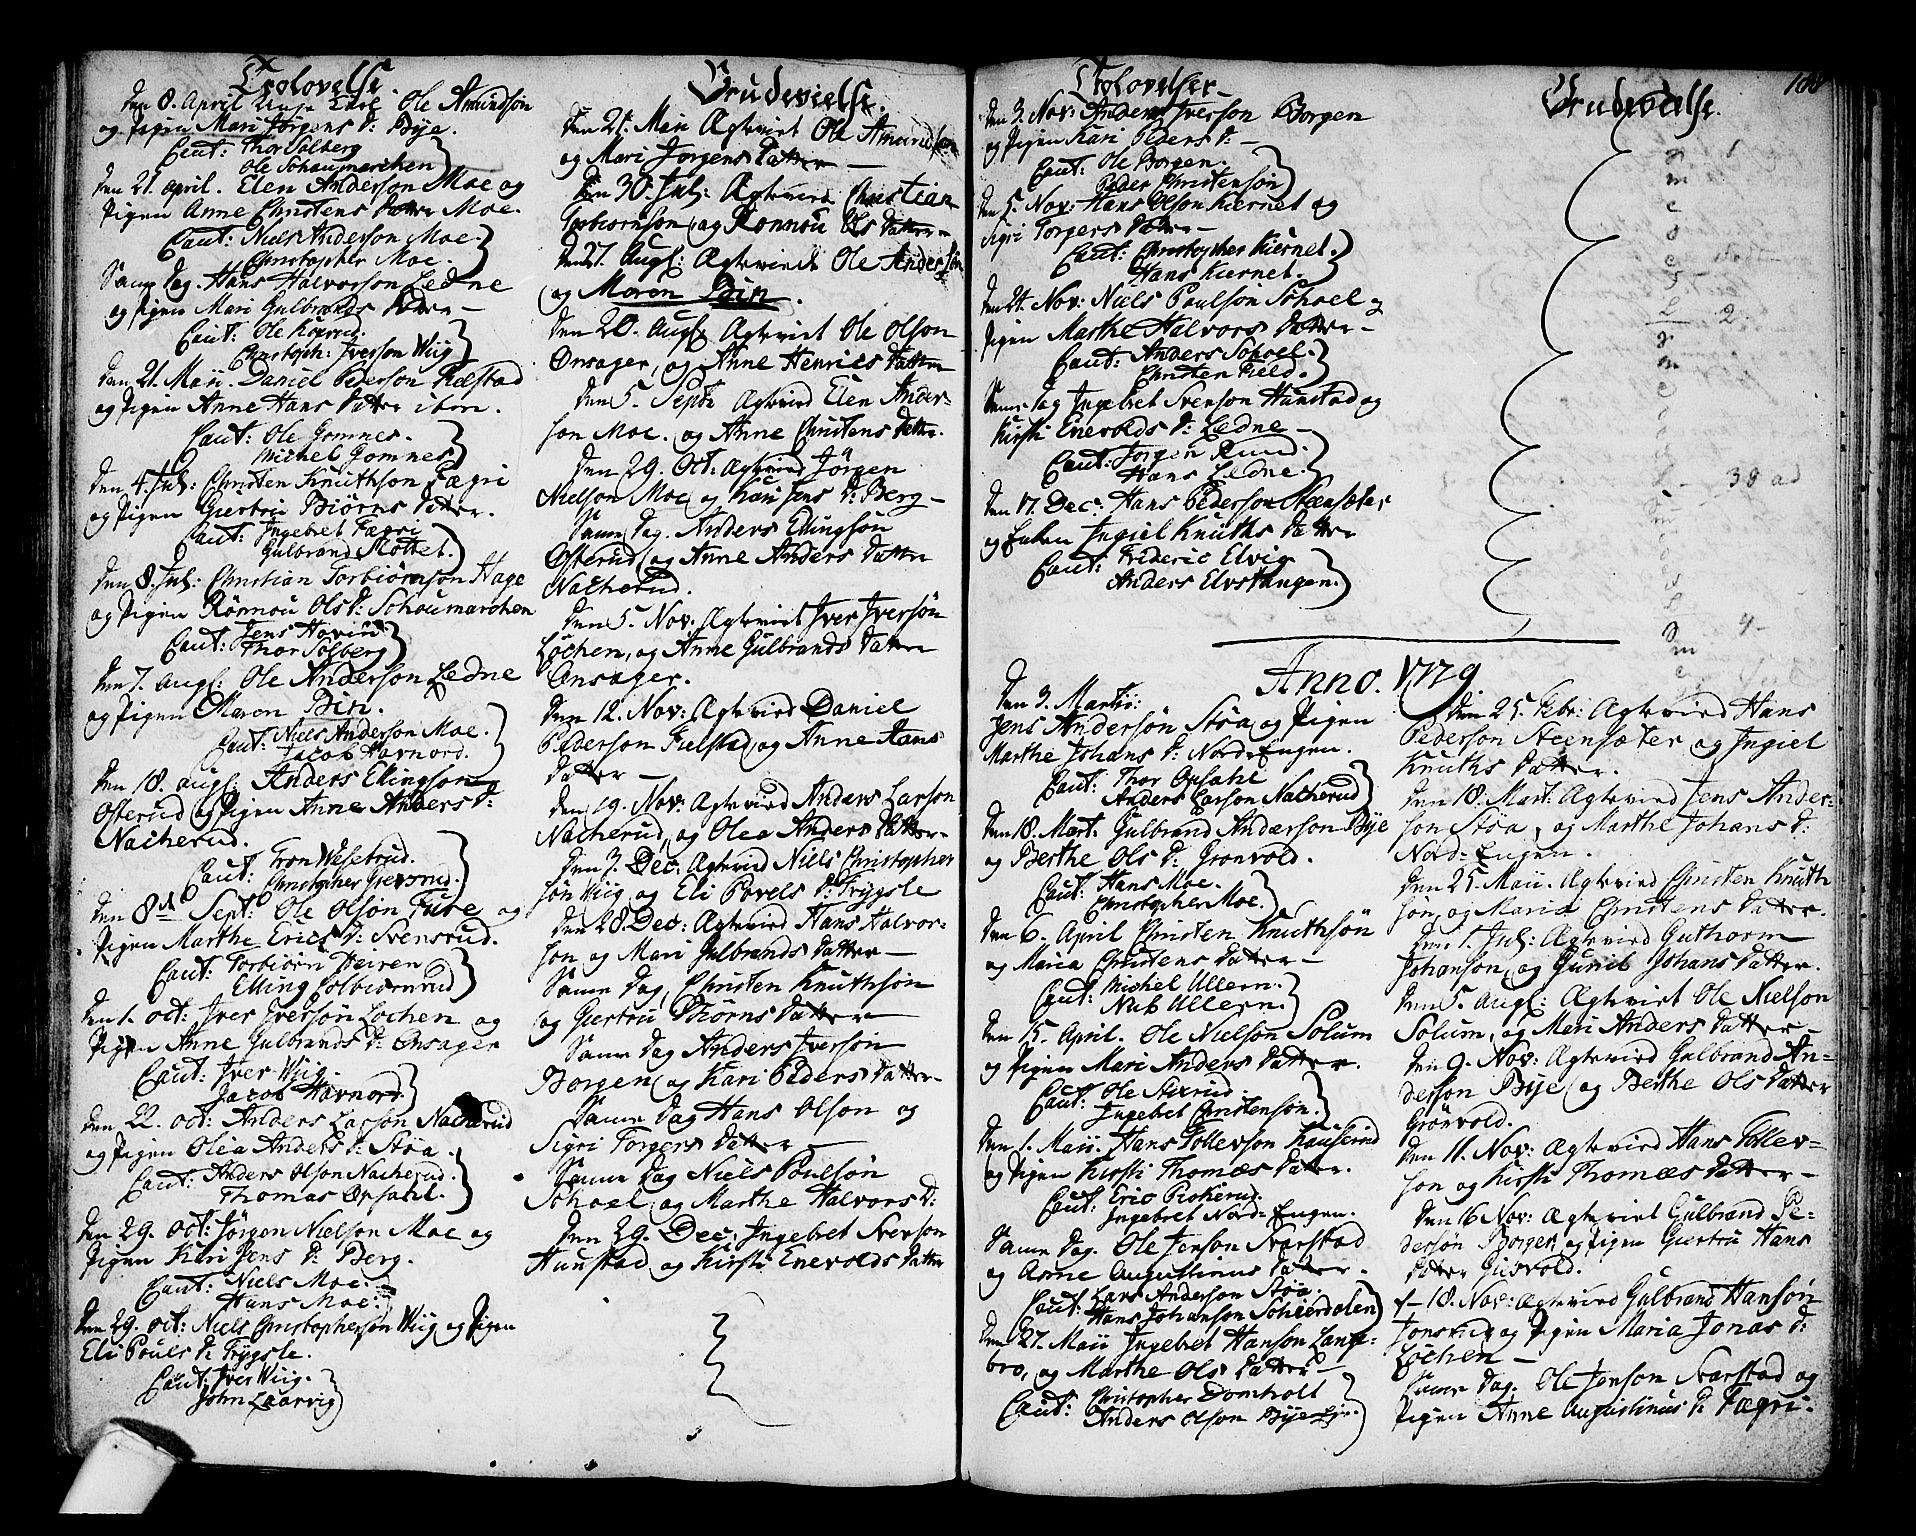 SAKO, Hole kirkebøker, F/Fa/L0002: Ministerialbok nr. I 2, 1766-1814, s. 188